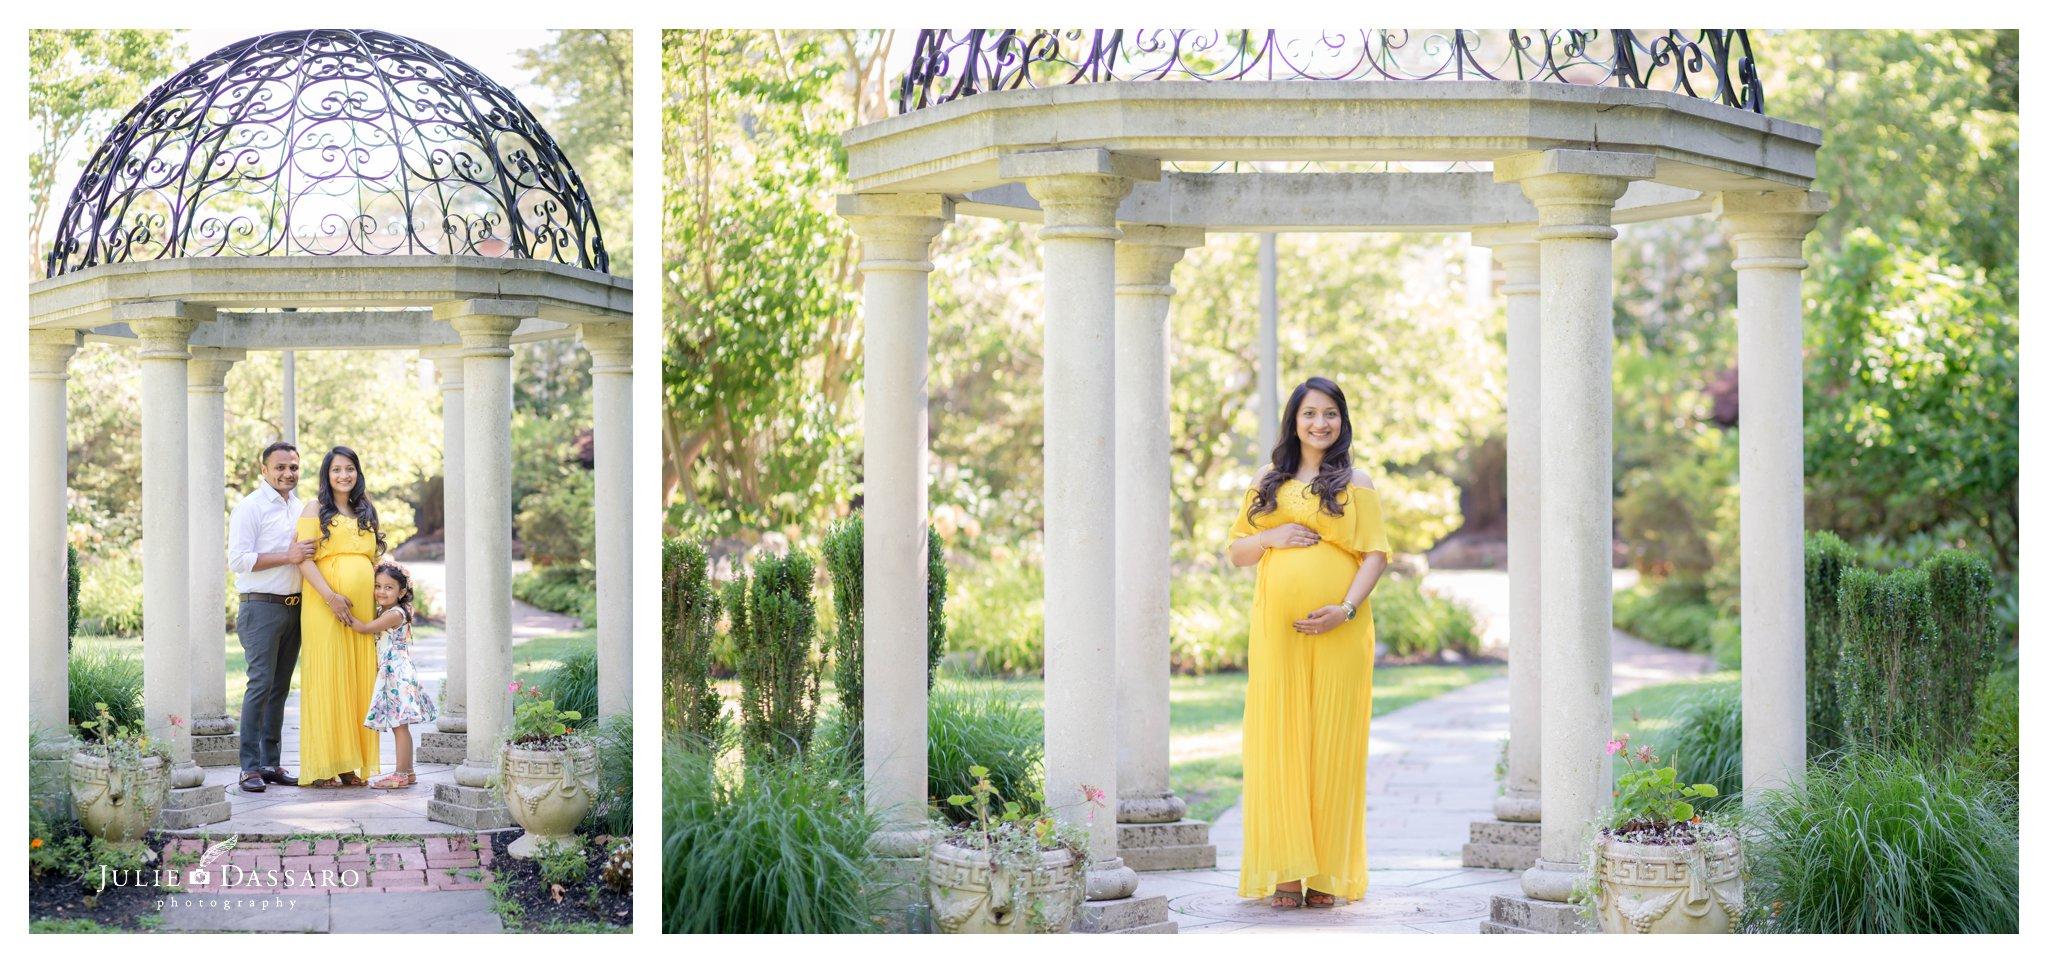 maternity portrait in yellow dress